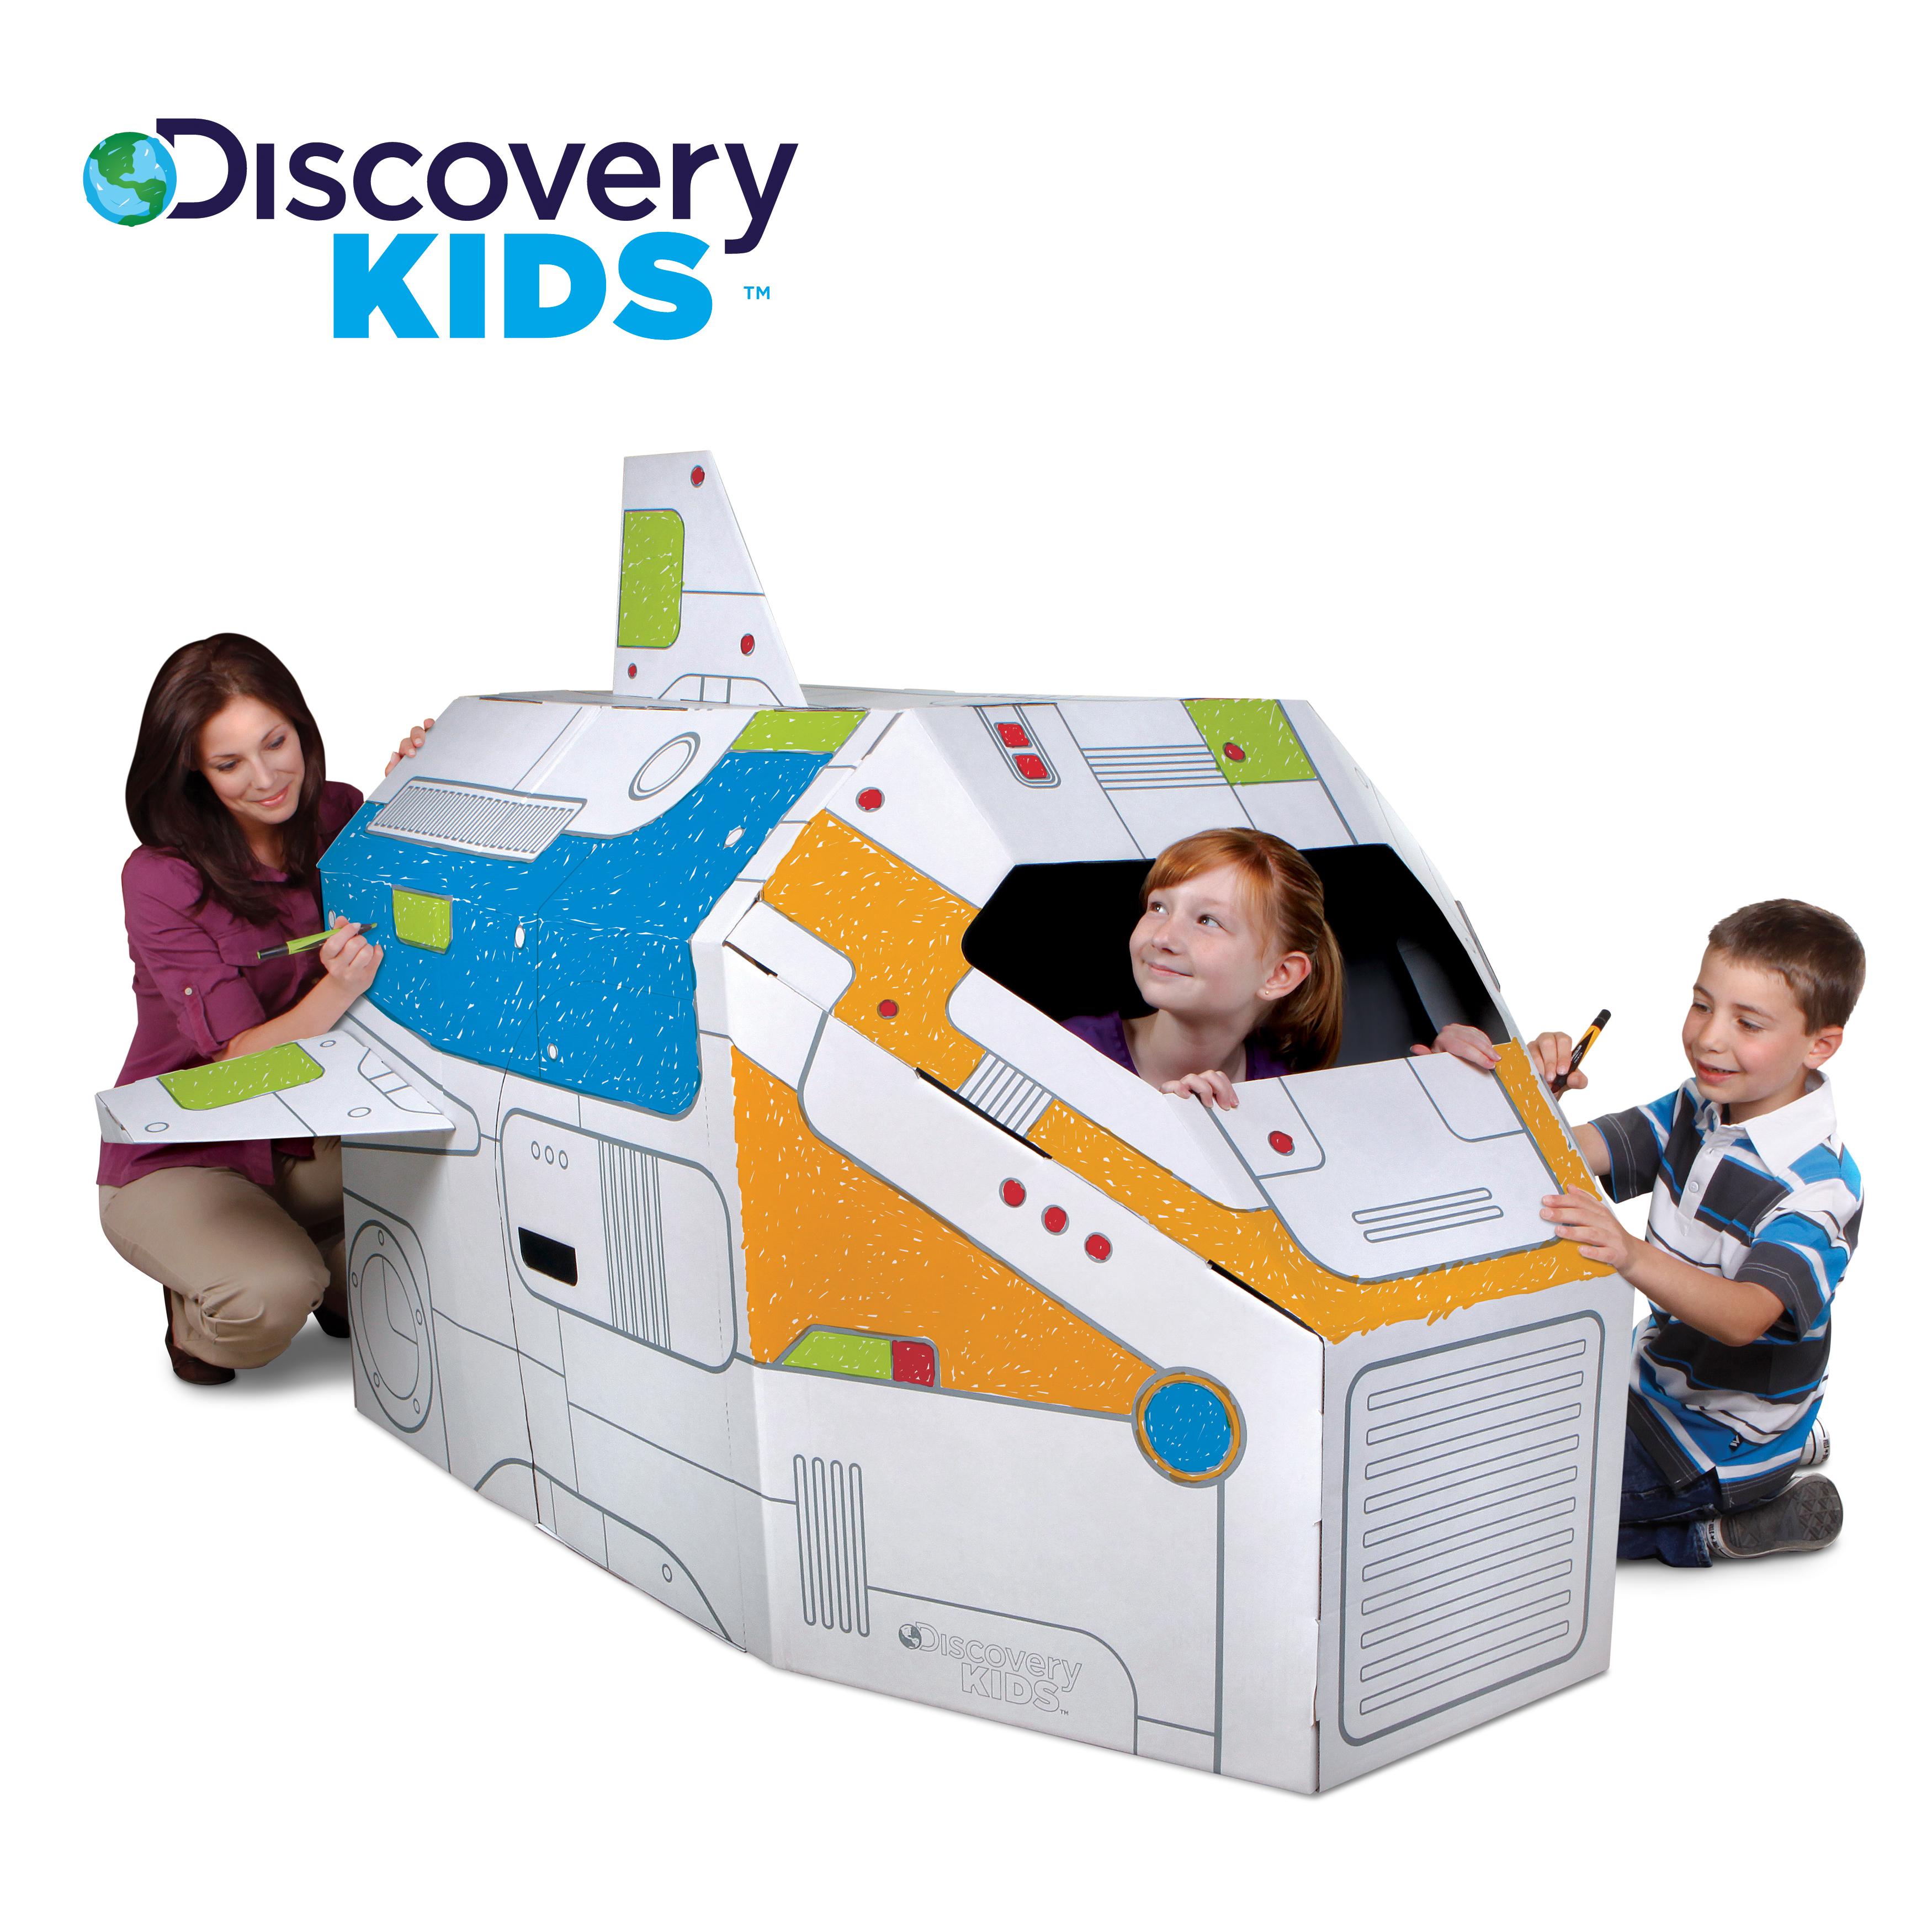 discovery kids 5 ft cardboard rocket ship check back soon blinq